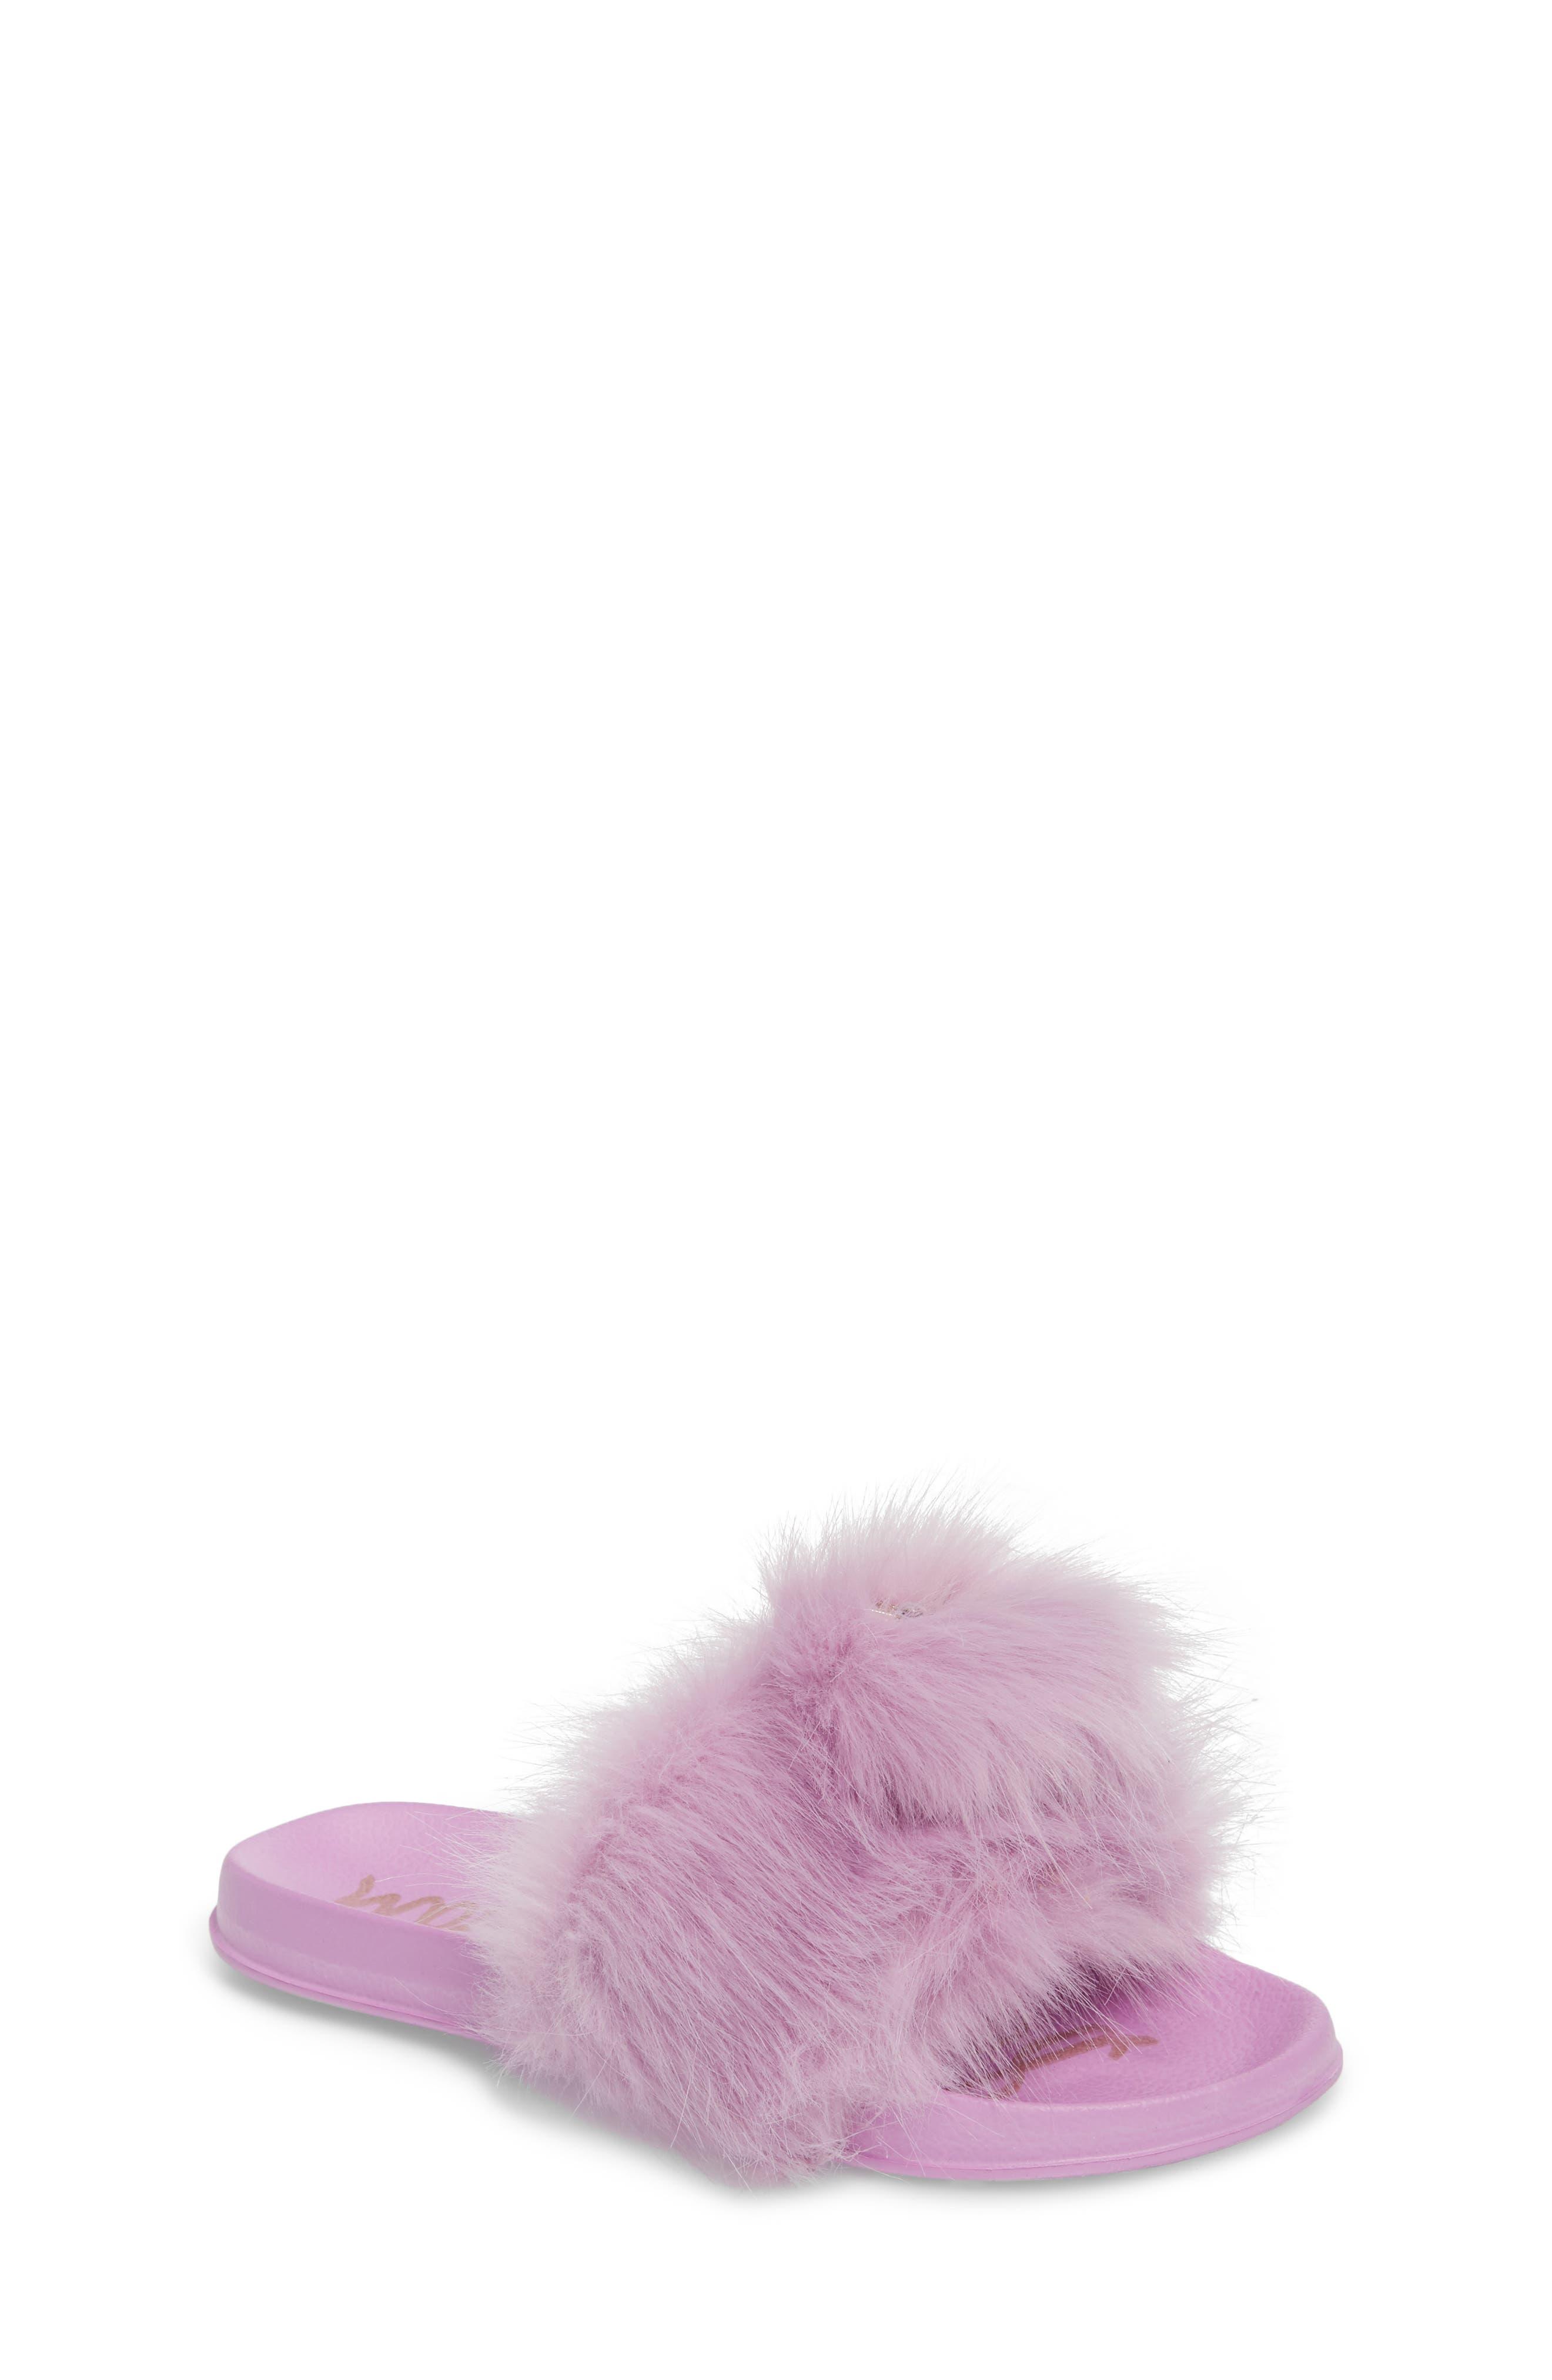 Sam Edelman Mackie Aster Faux Fur Slide Sandal (Toddler, Little Kid & Big Kid)